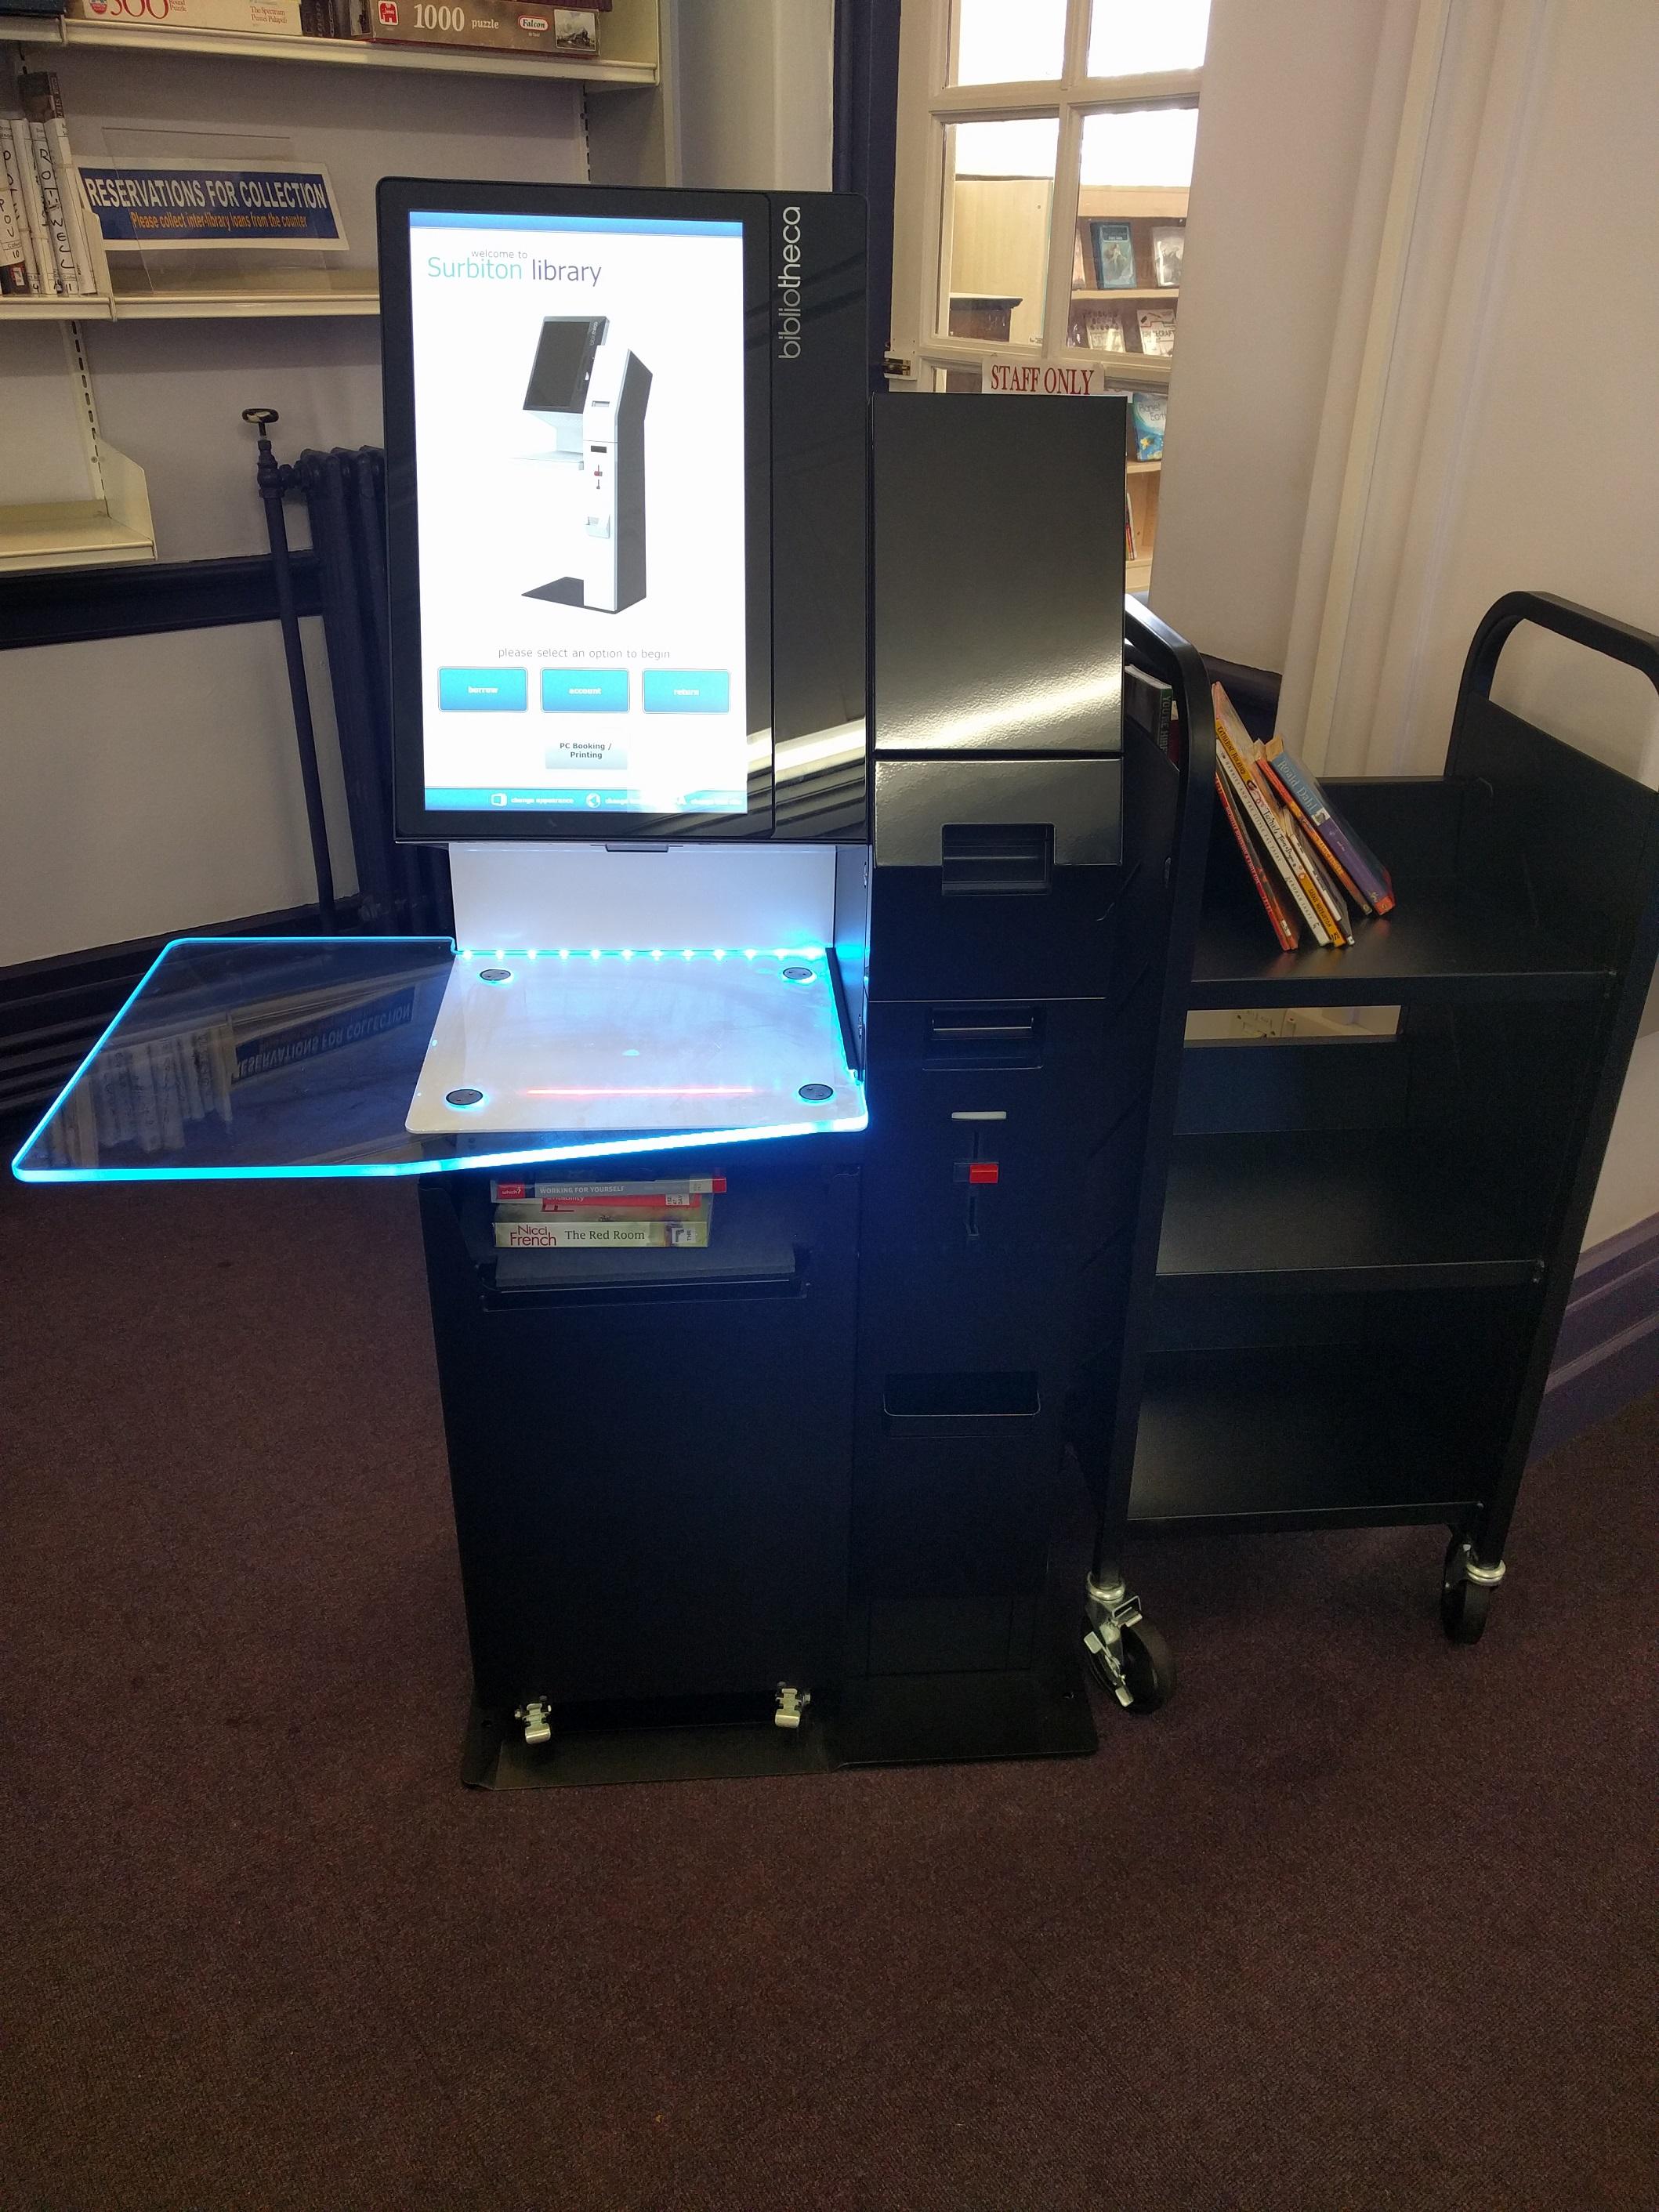 Library self-service machine